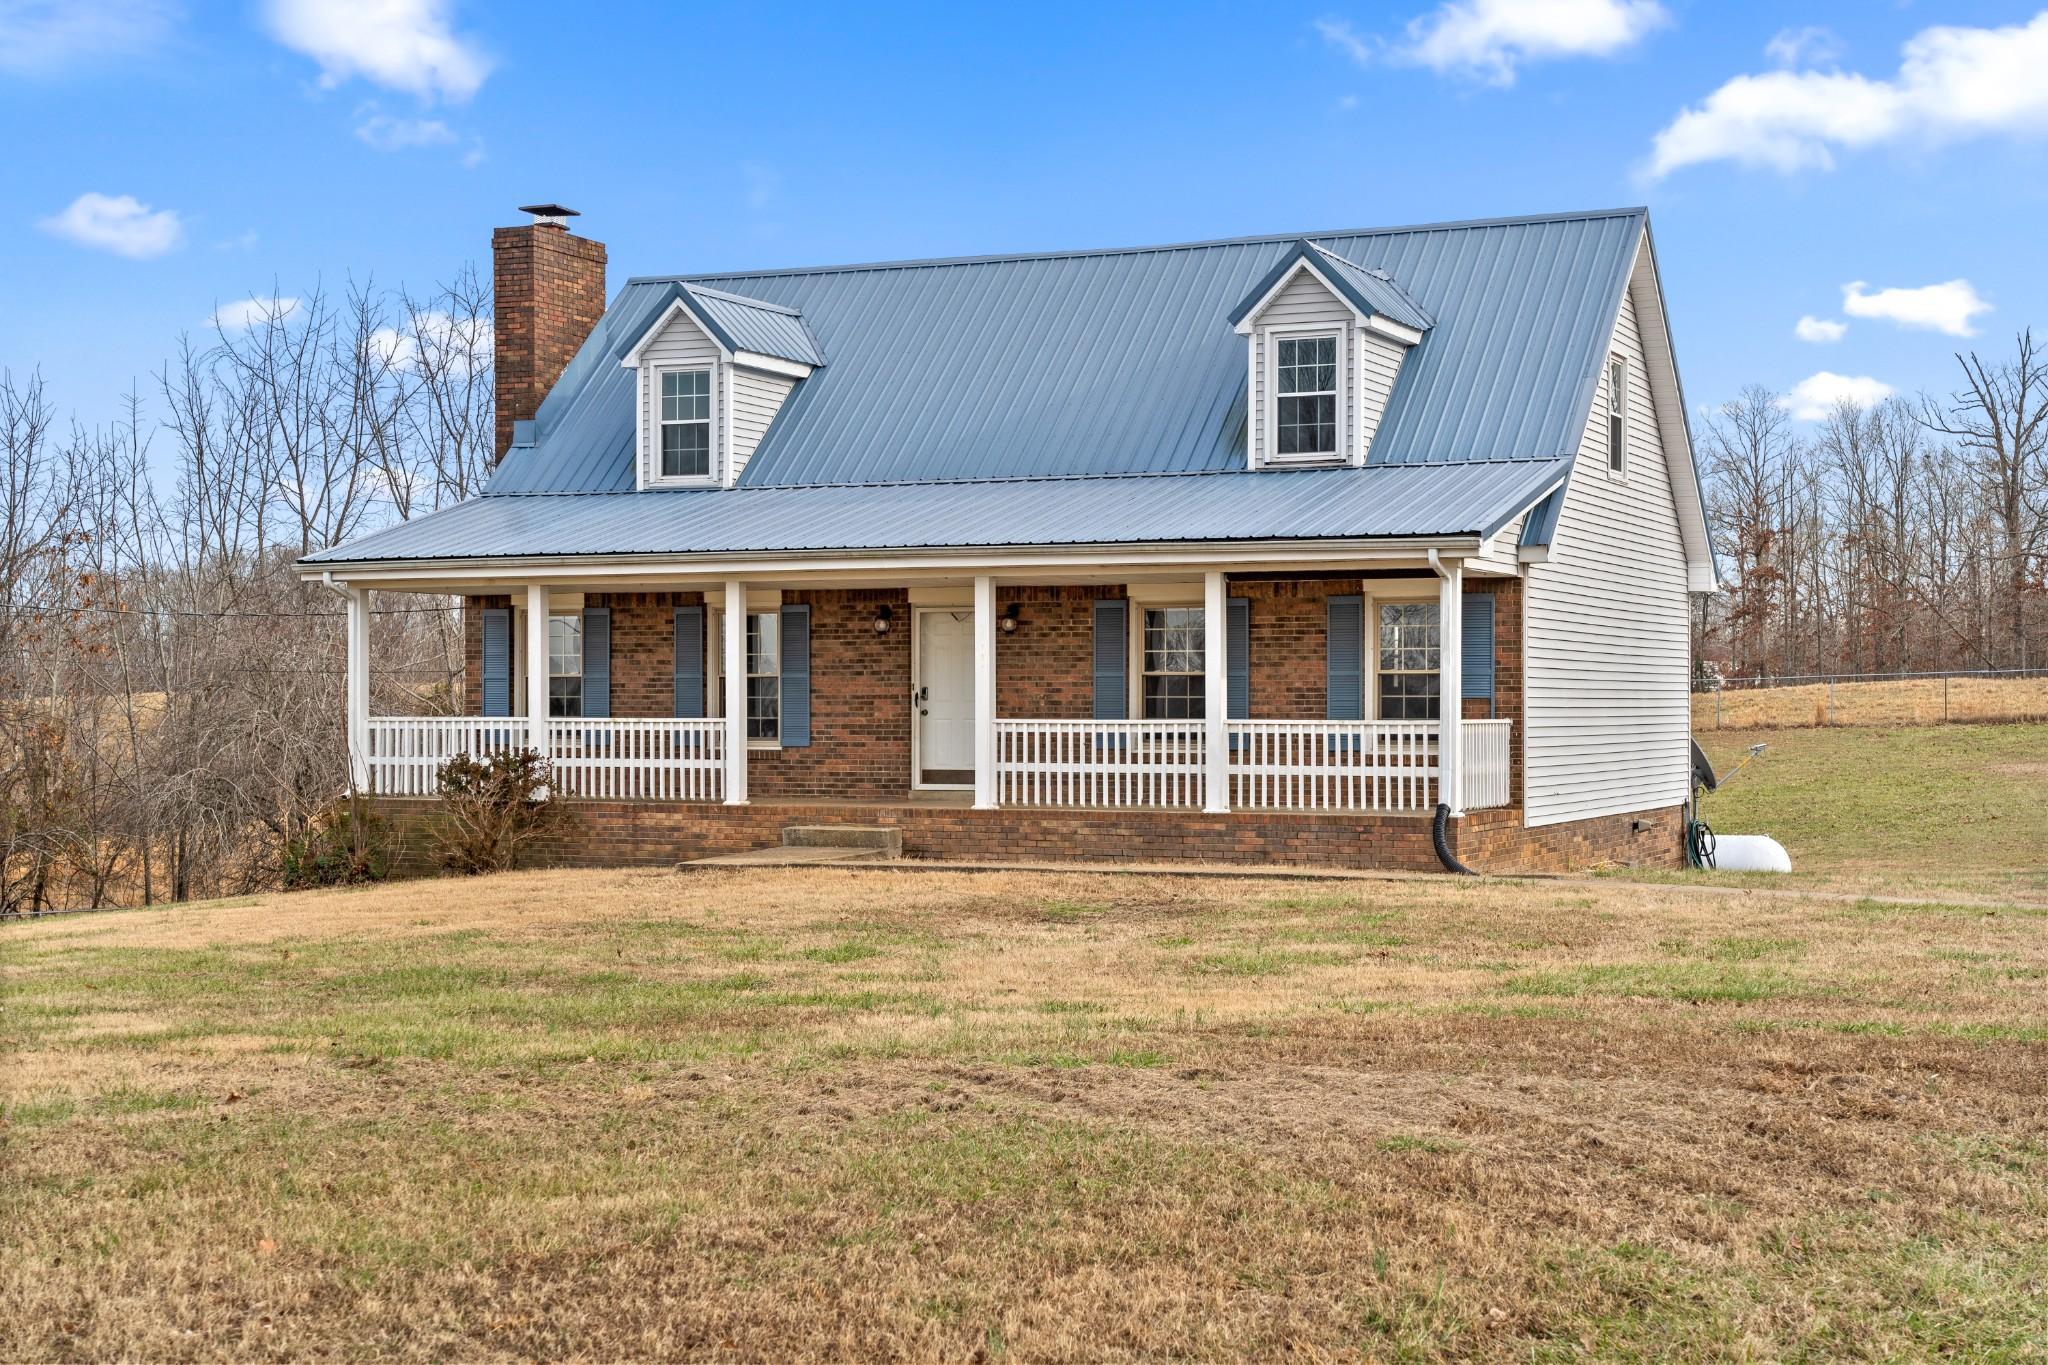 5455 Bales Rd, Cunningham, TN 37052 - Cunningham, TN real estate listing